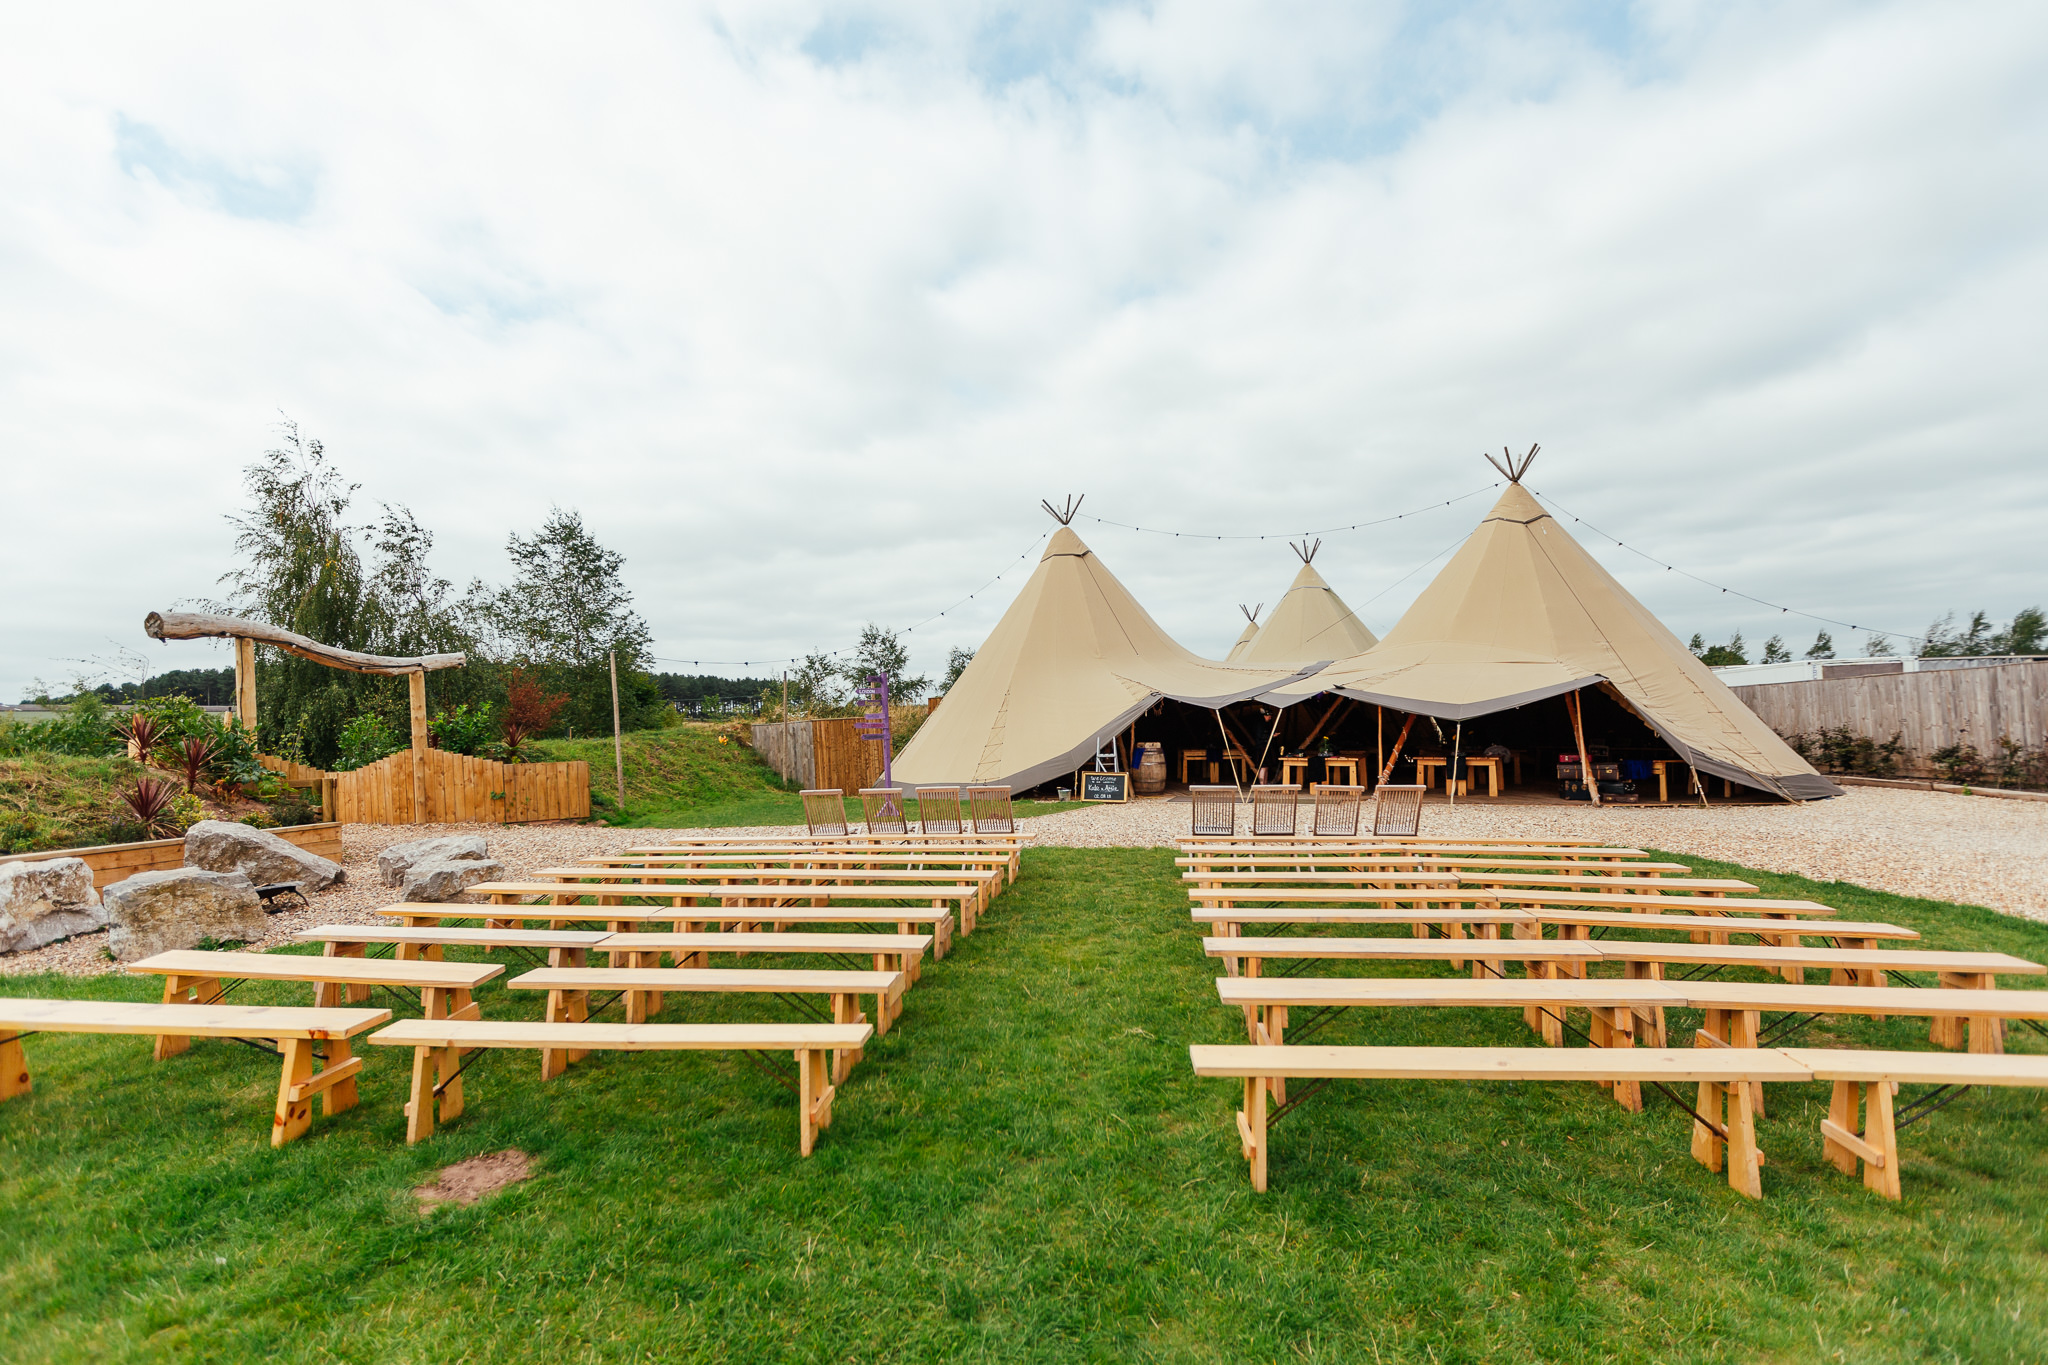 Inkersall-grange-farm-wedding-11.jpg